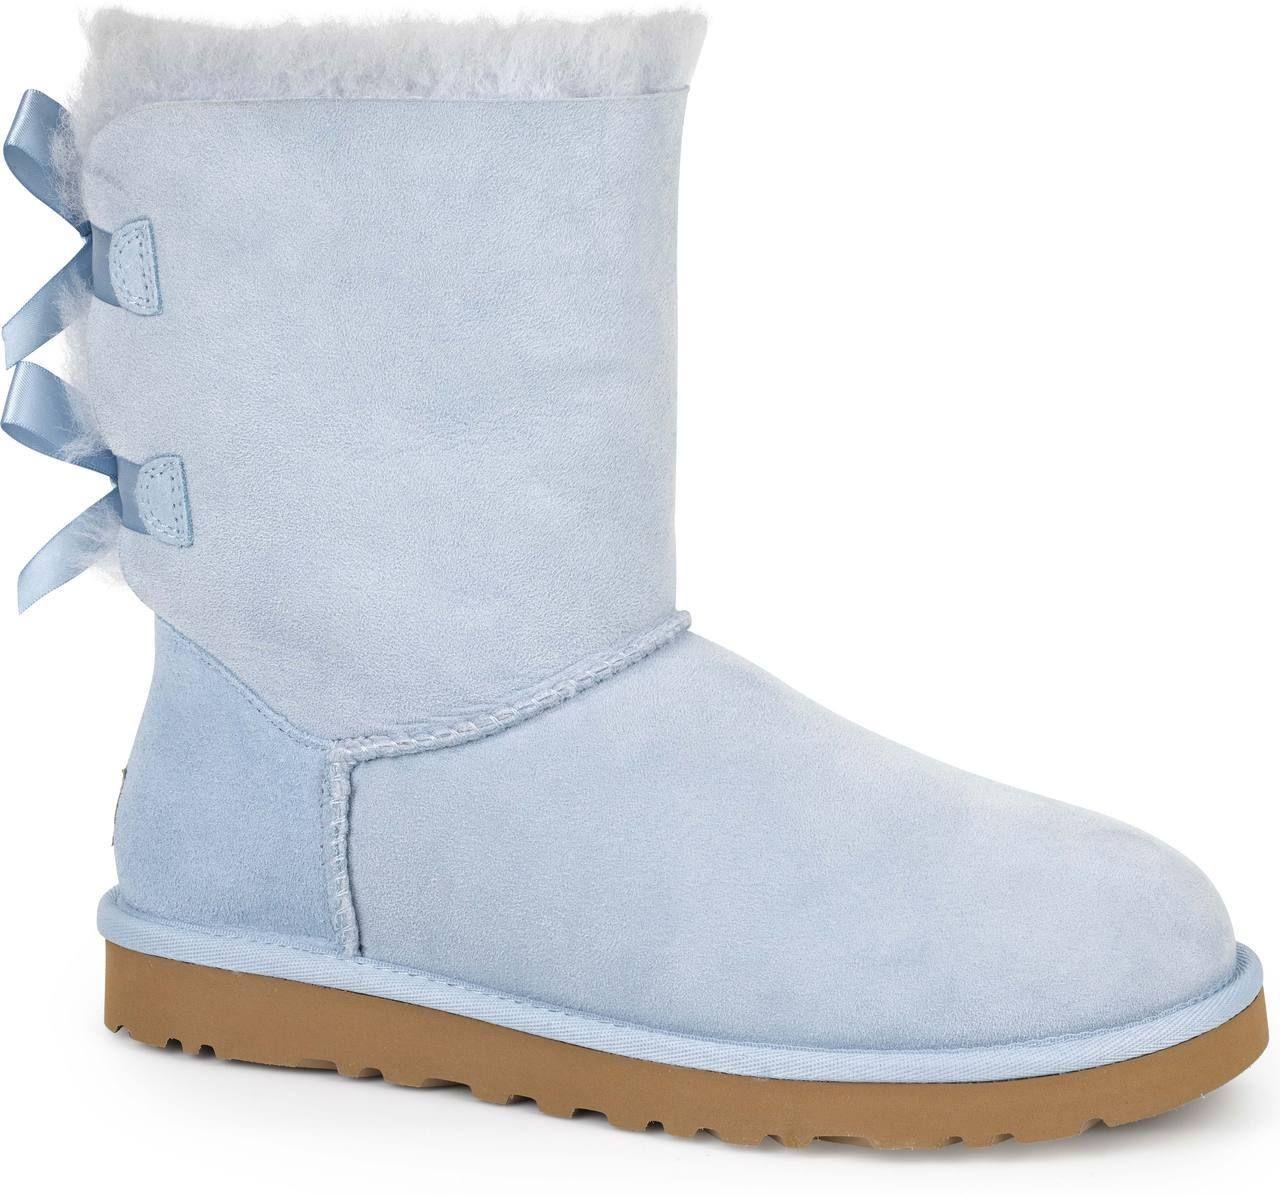 856affd4bca Horizon Blue   Uggs   Ugg boots australia, Blue ankle boots, Ugg ...